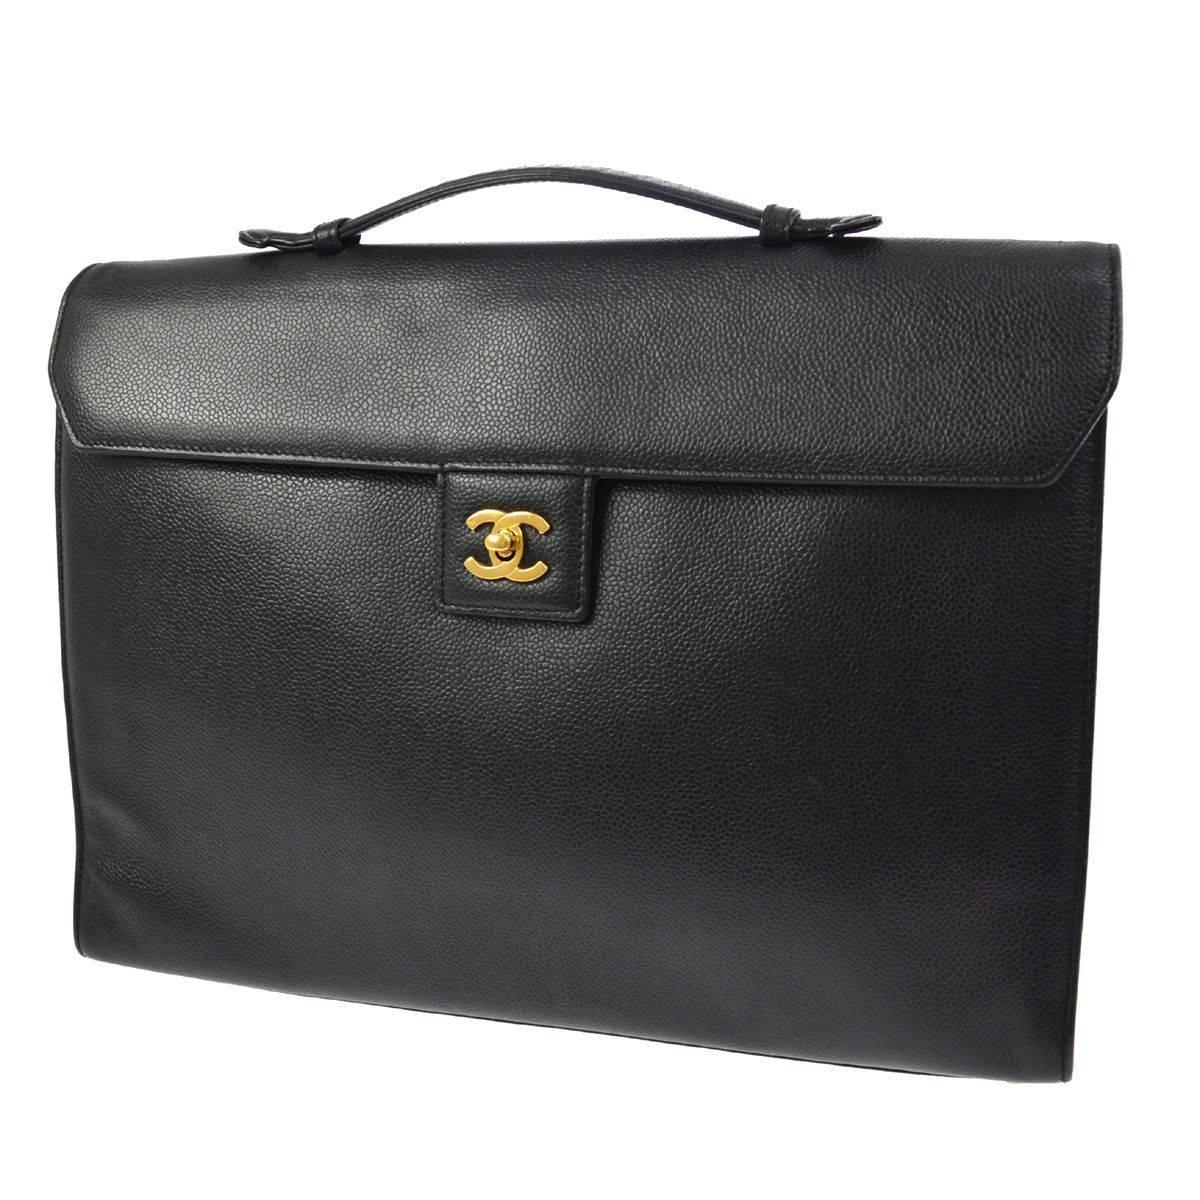 Chanel Back Leather Top Handle Men's Women'